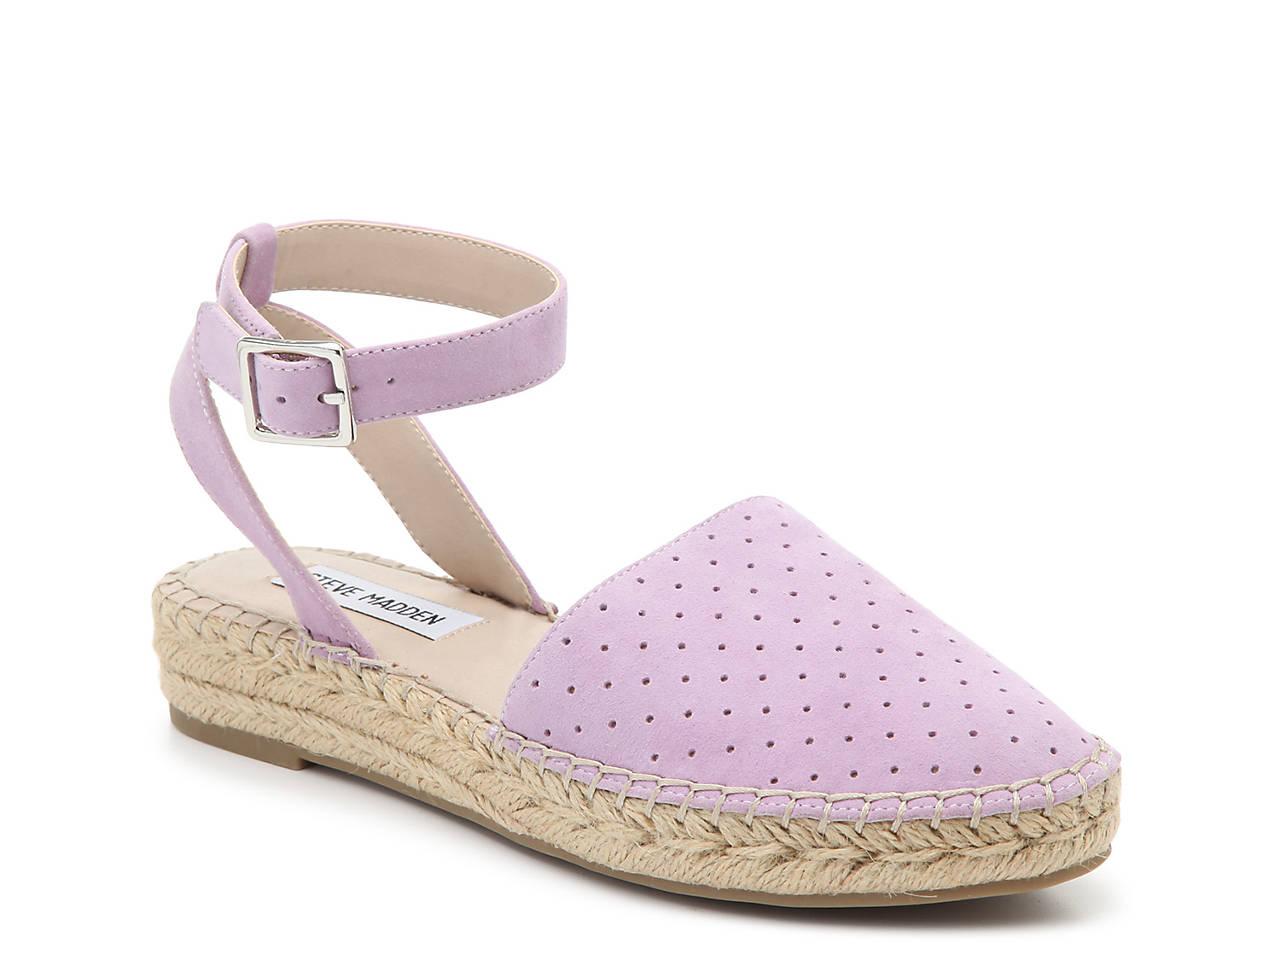 009c5dbeb46 Steve Madden Lesko Espadrille Flat Women s Shoes